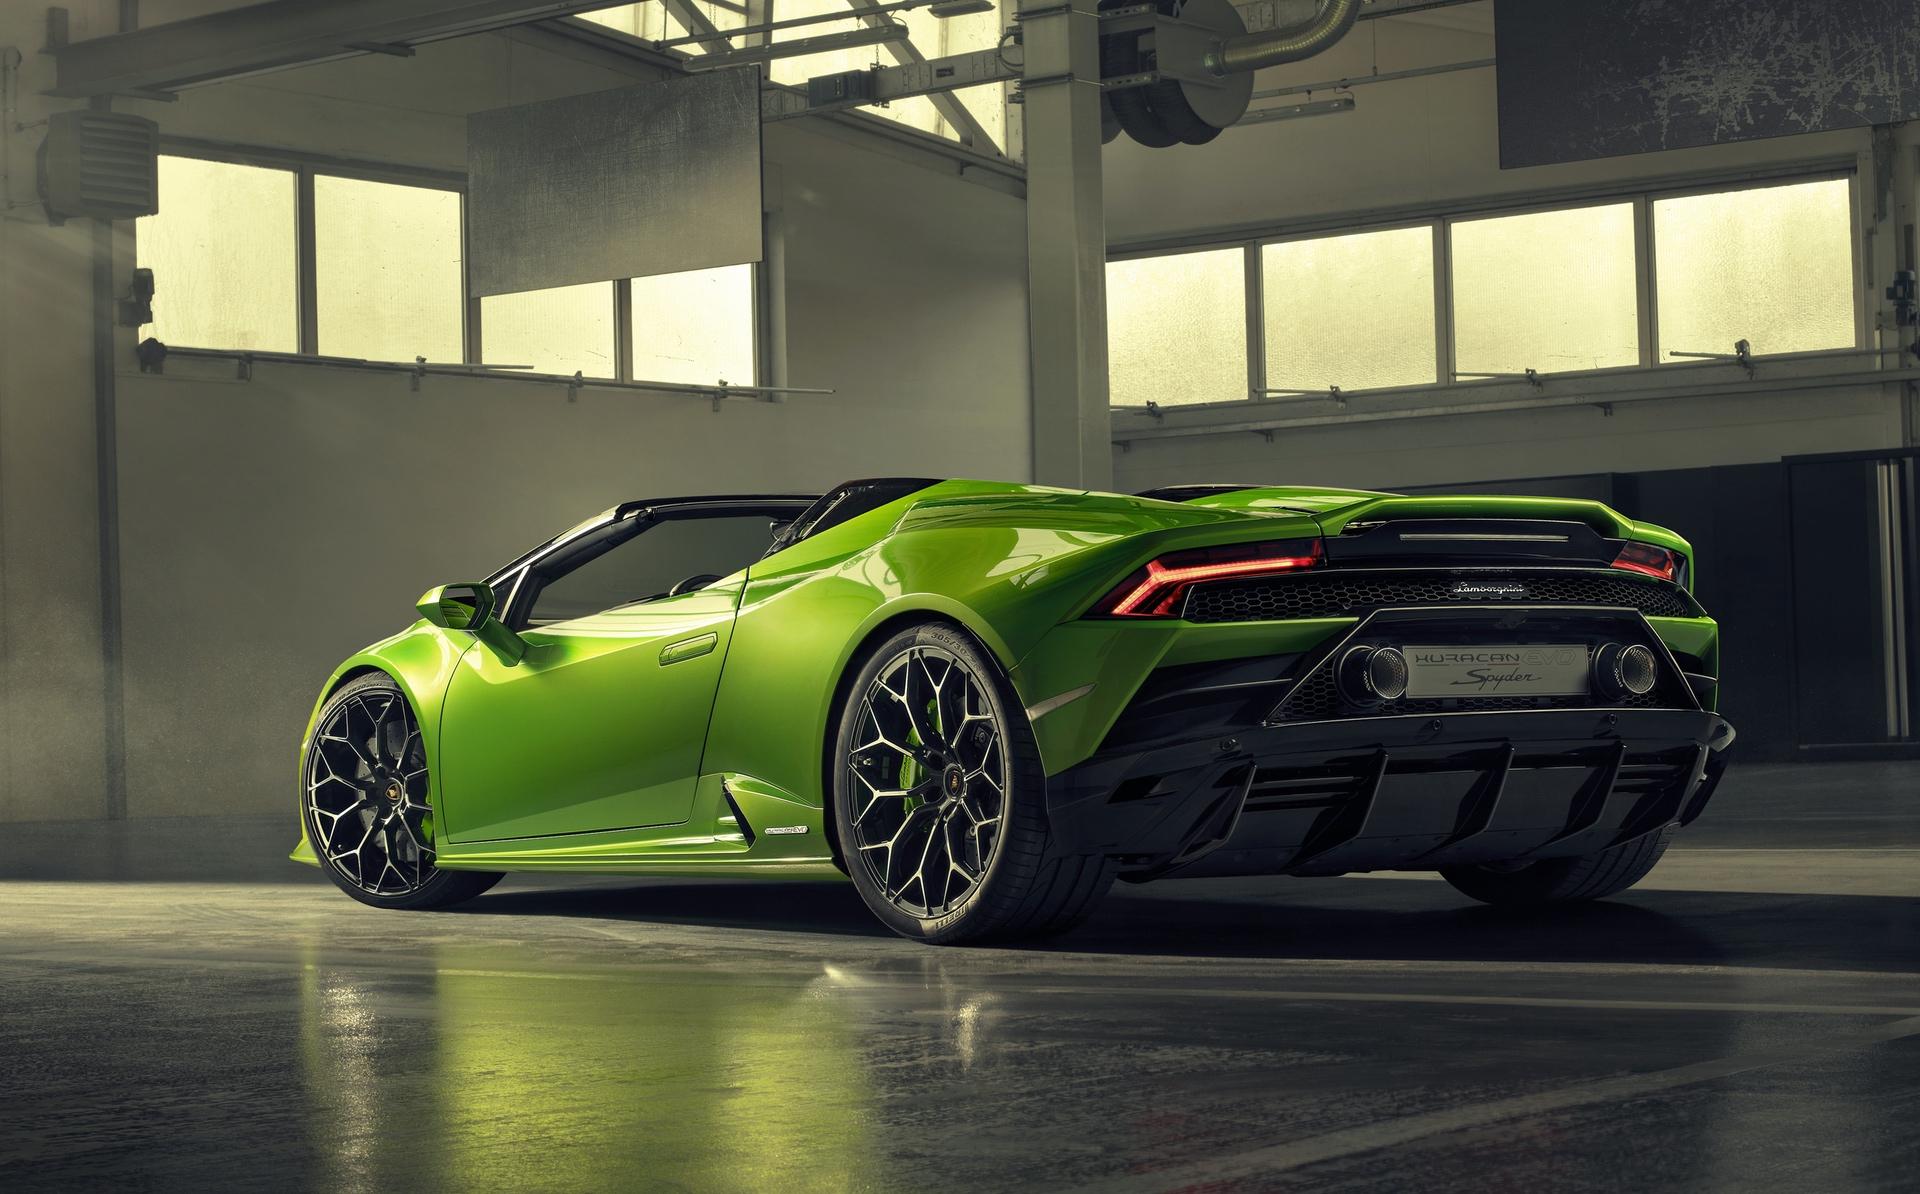 Lamborghini_Huracan_Evo_Spyder_0018